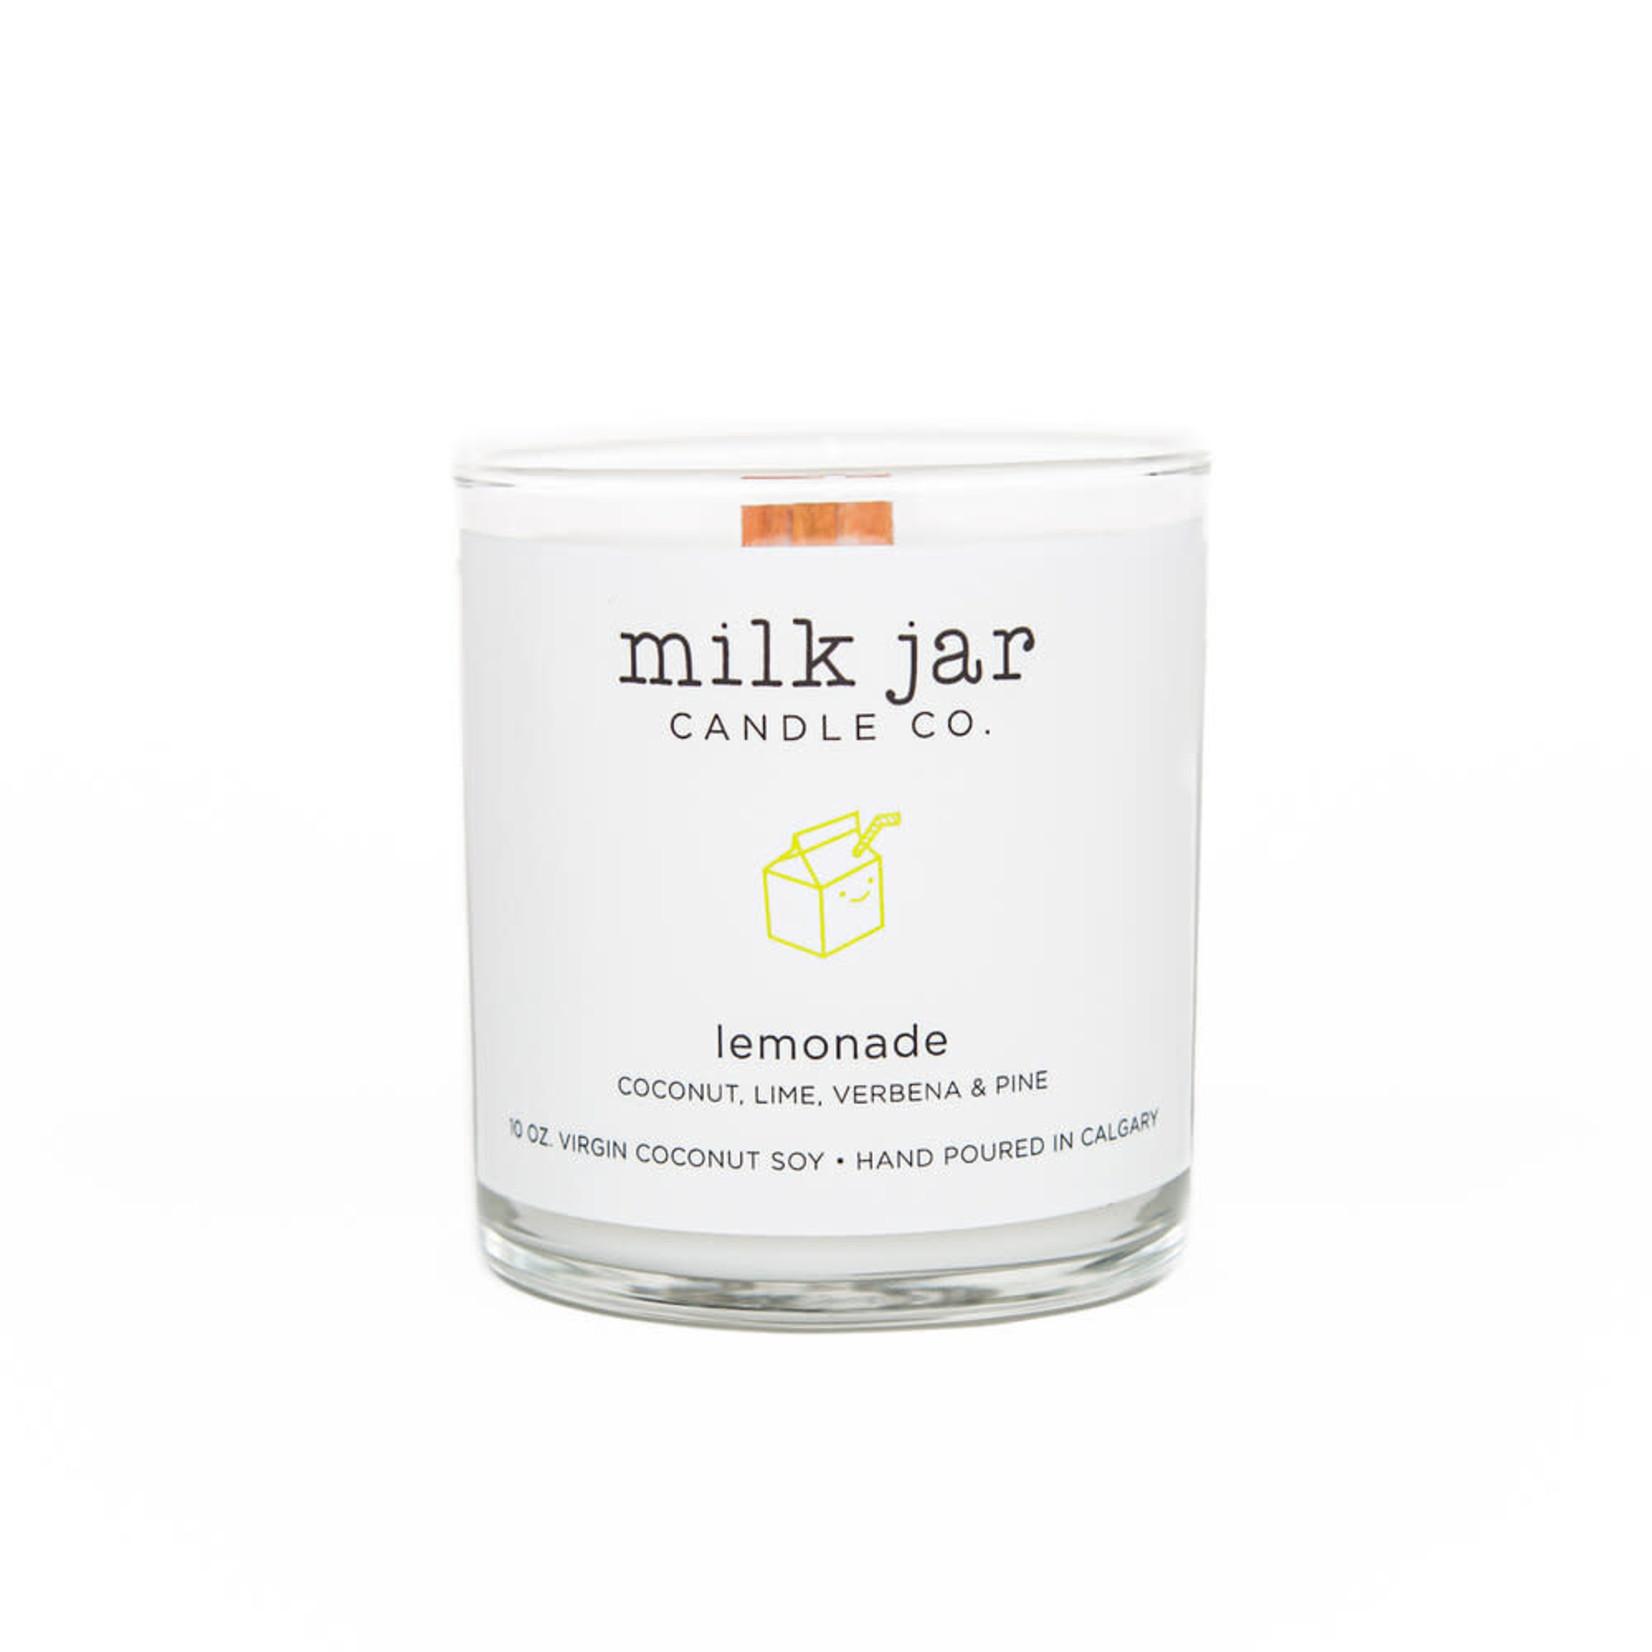 Milk Jar Candle Co. Lemonade Candle